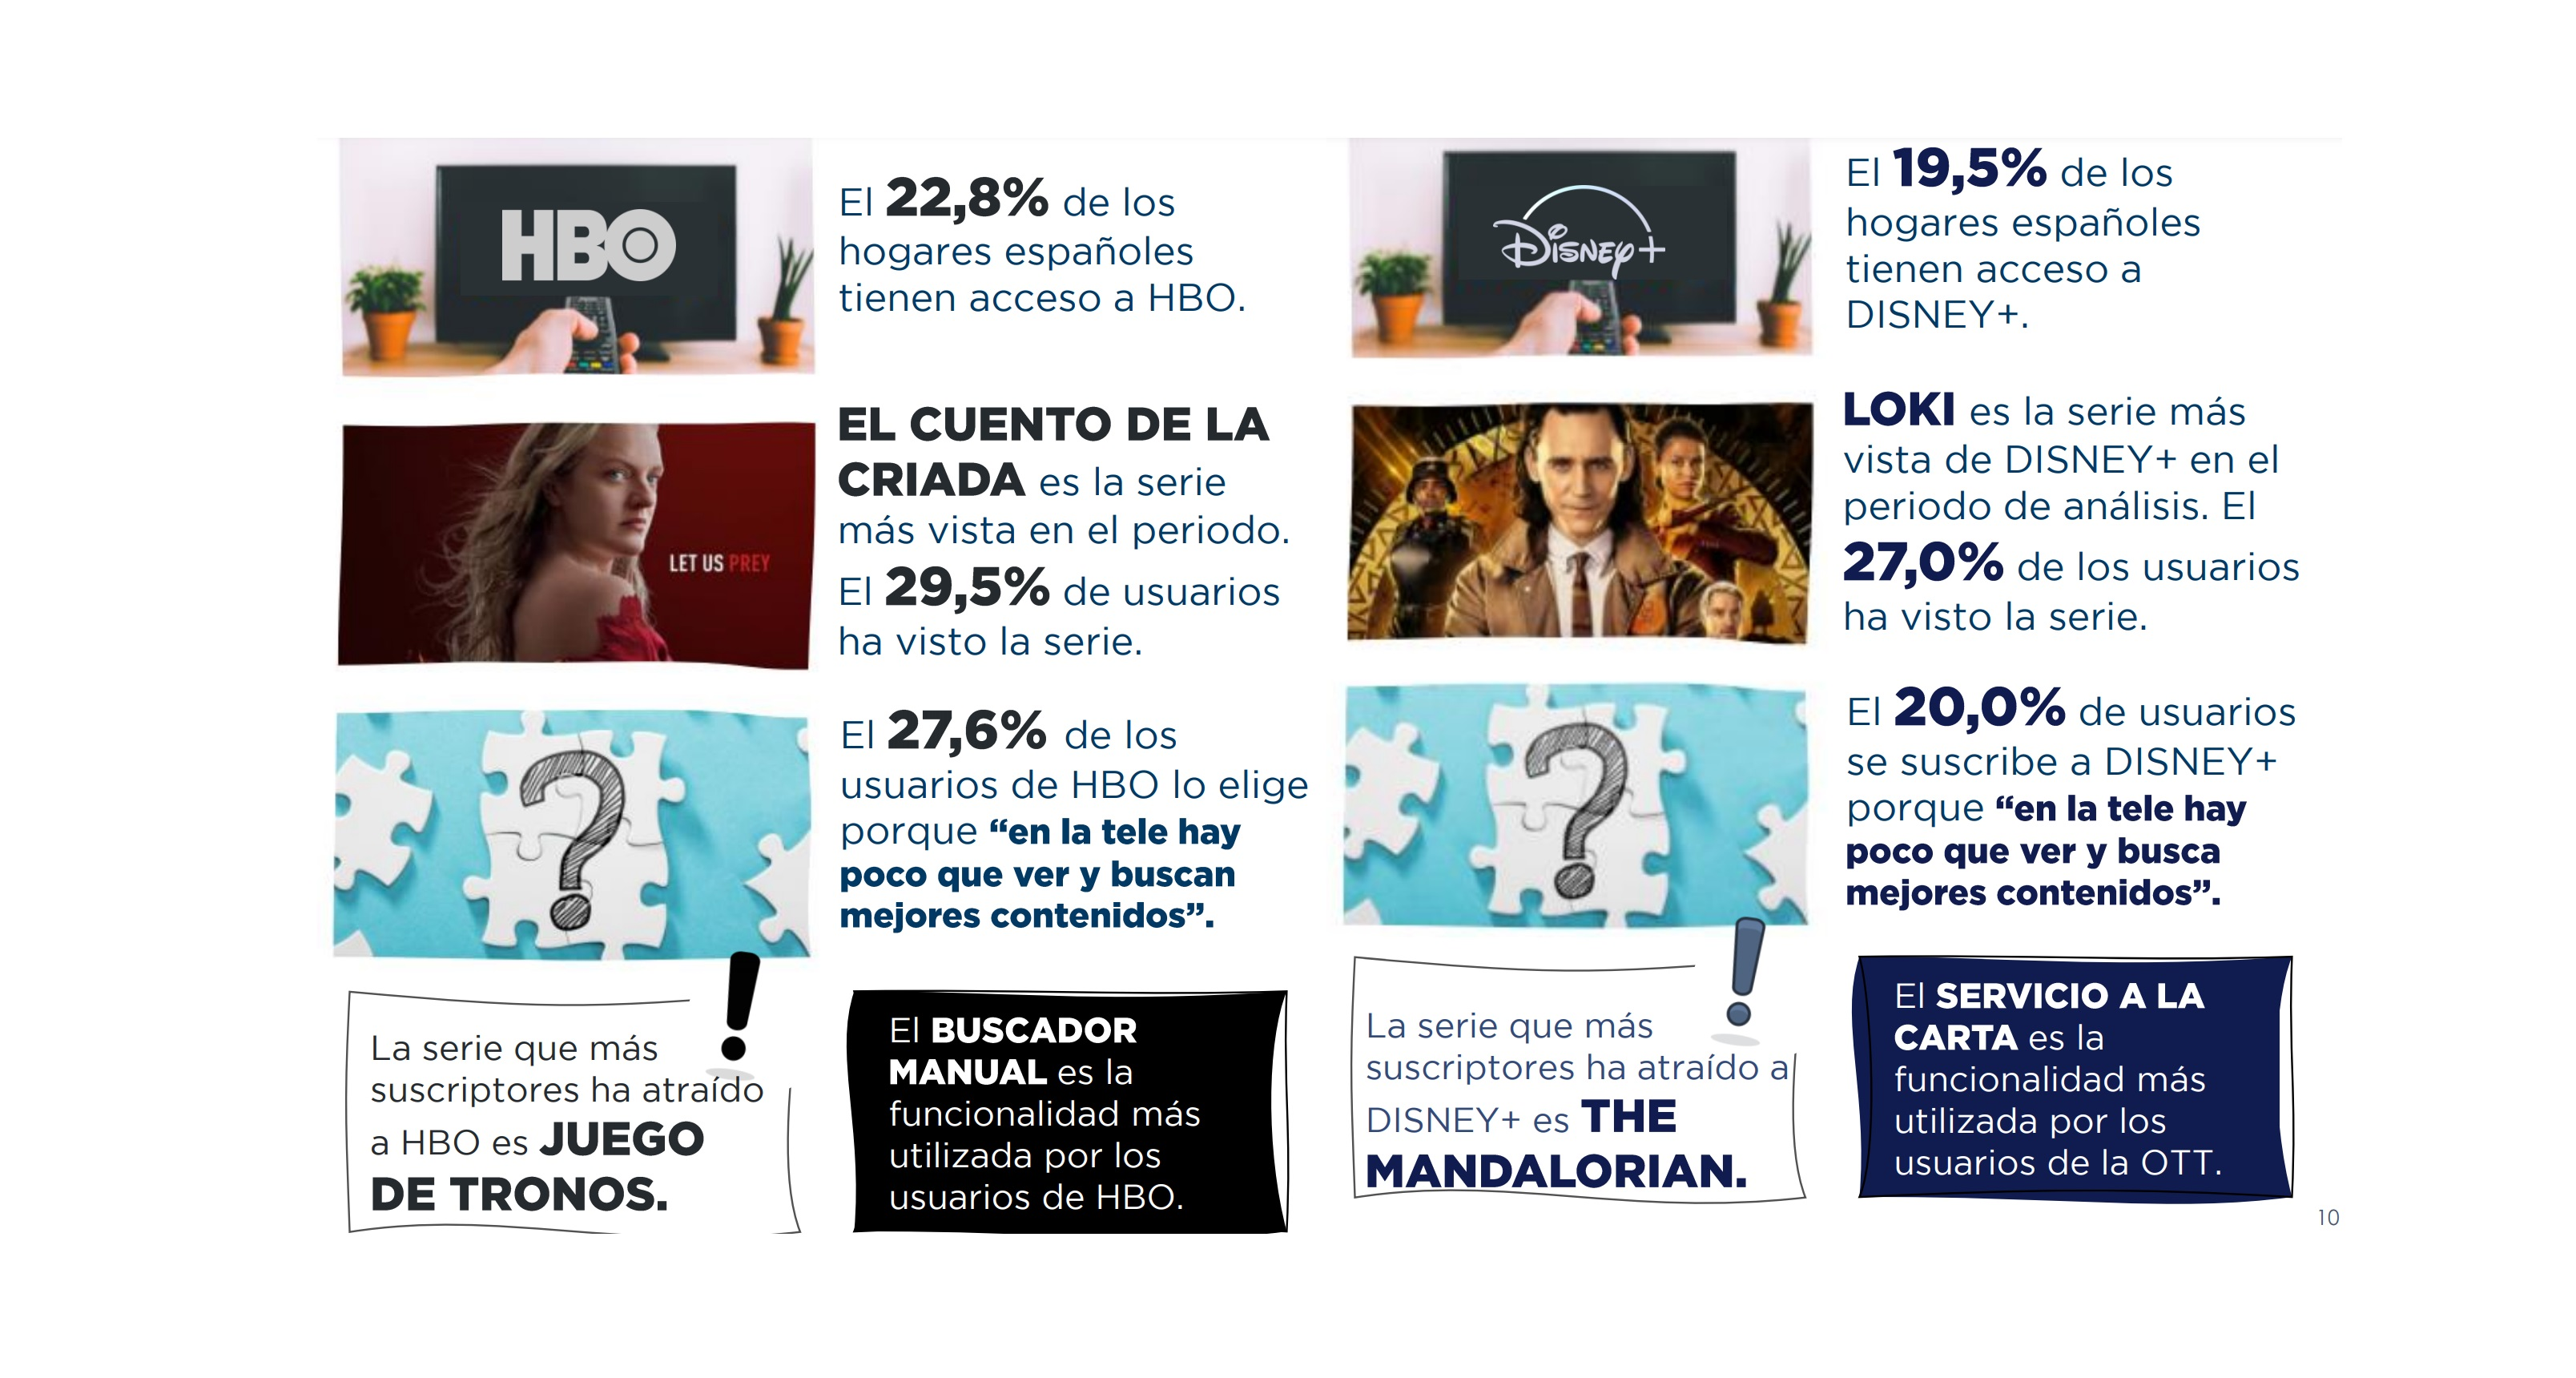 https://www.programapublicidad.com/wp-content/uploads/2021/07/HBO-Disney2ª-ola-2021-BARÓMETRO-TV-OTT-TRACKING-trimestral-Televisión-de-Pago-OTTs-España-plataformas-VOD-10.000-entrevistas-Barlovento-Comunicación-programapublicidad.jpg